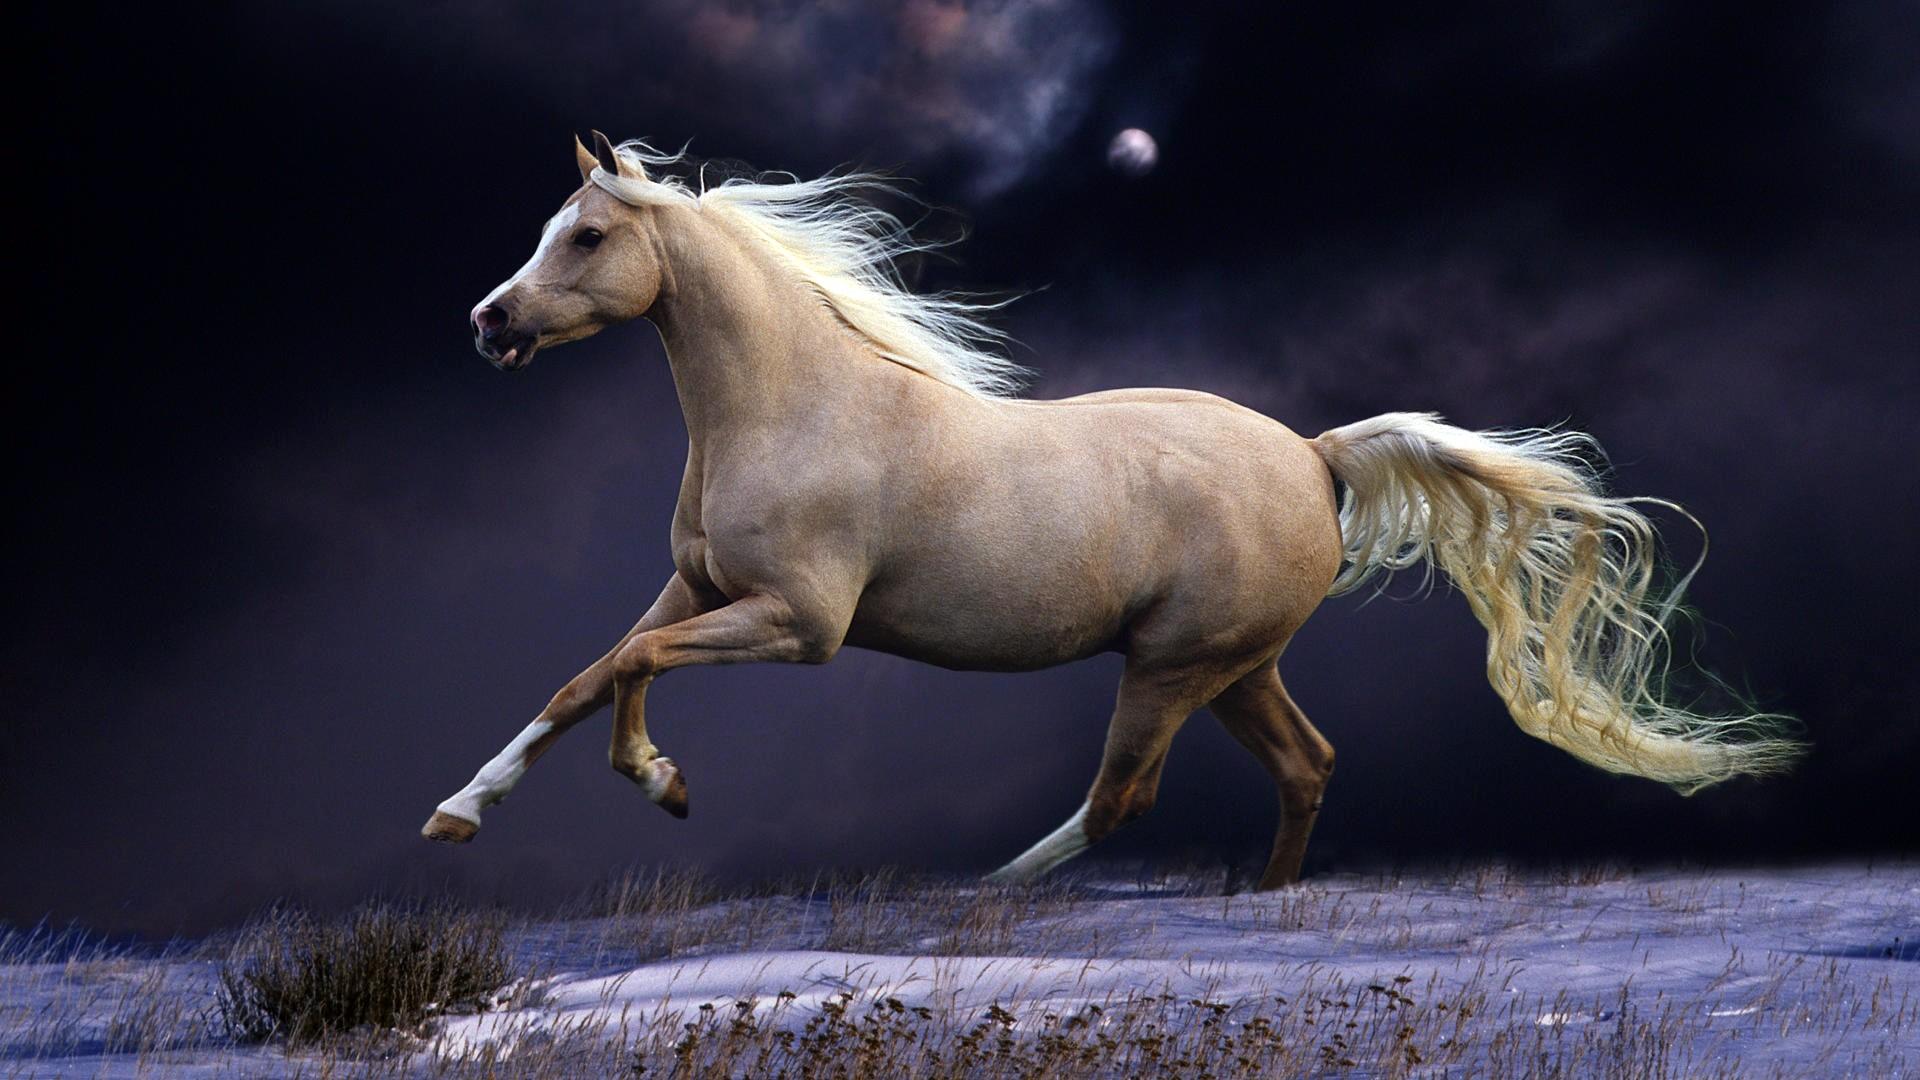 Beautiful Horse Wallpaper 66 Images